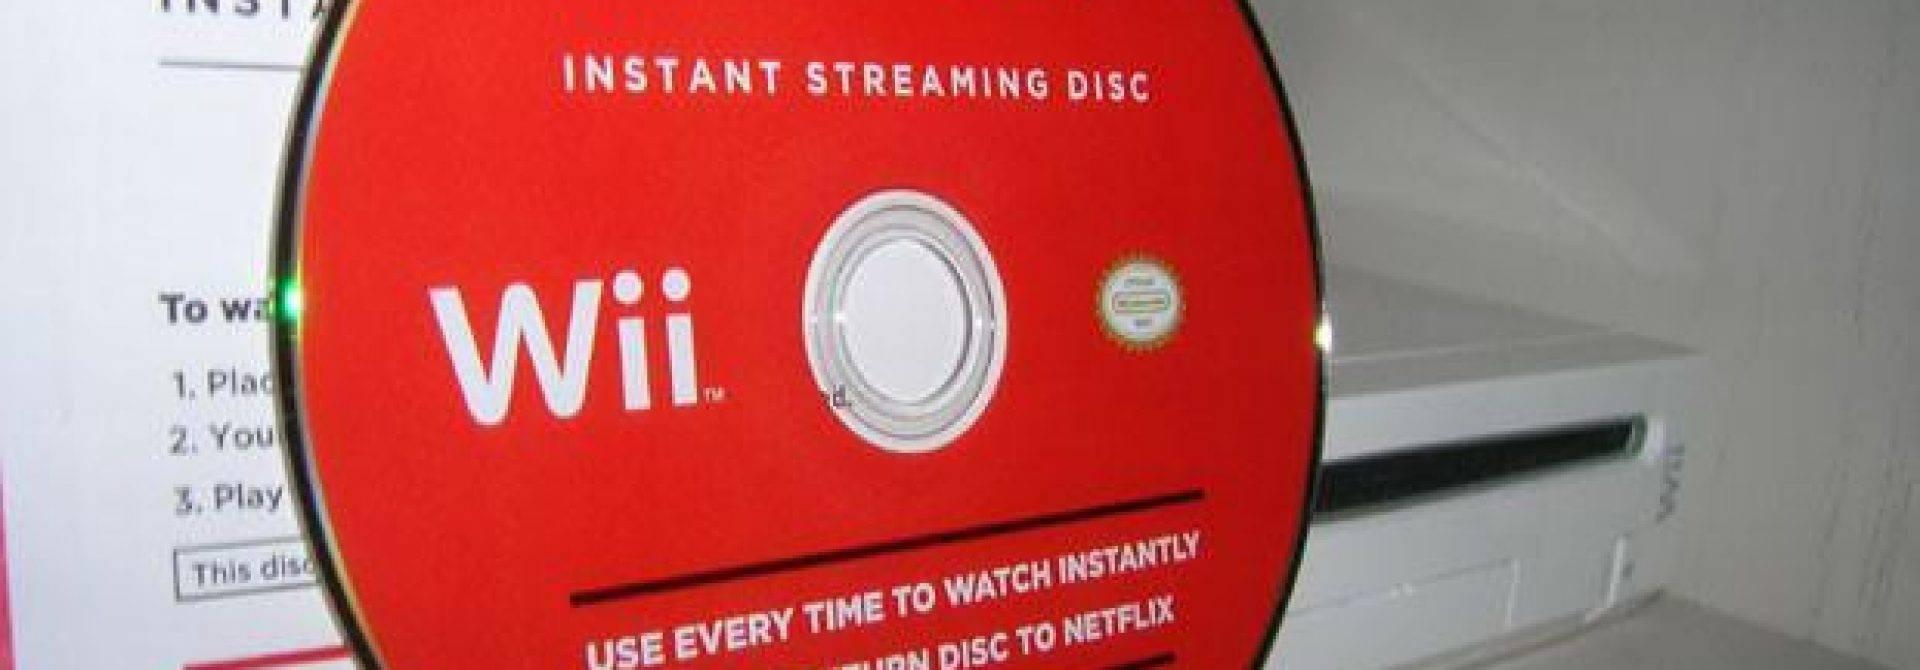 Netflix Leaves Original Wii Next January